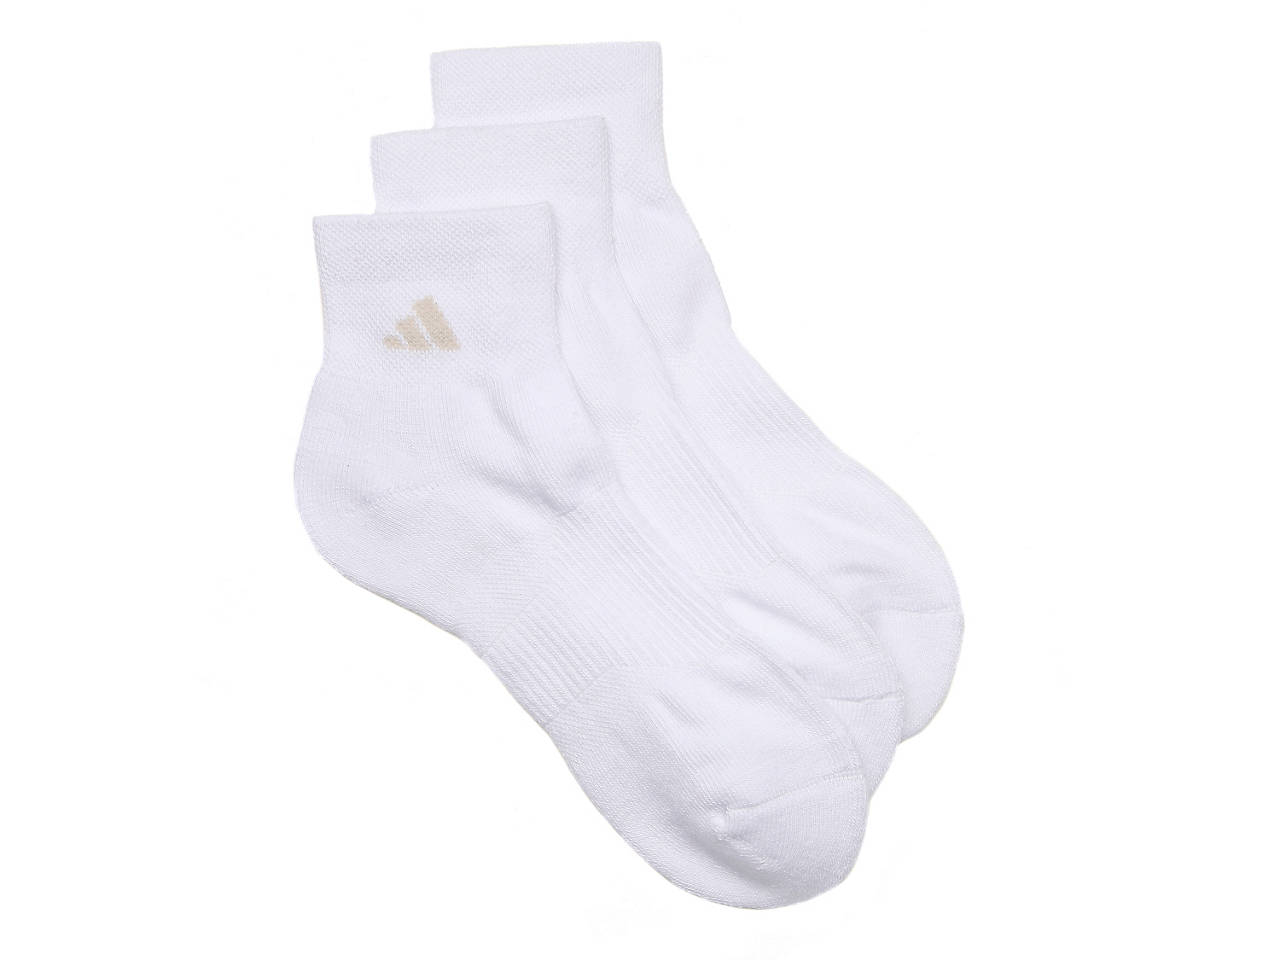 Adidas Cushioned Ankle Socken 3er Pack